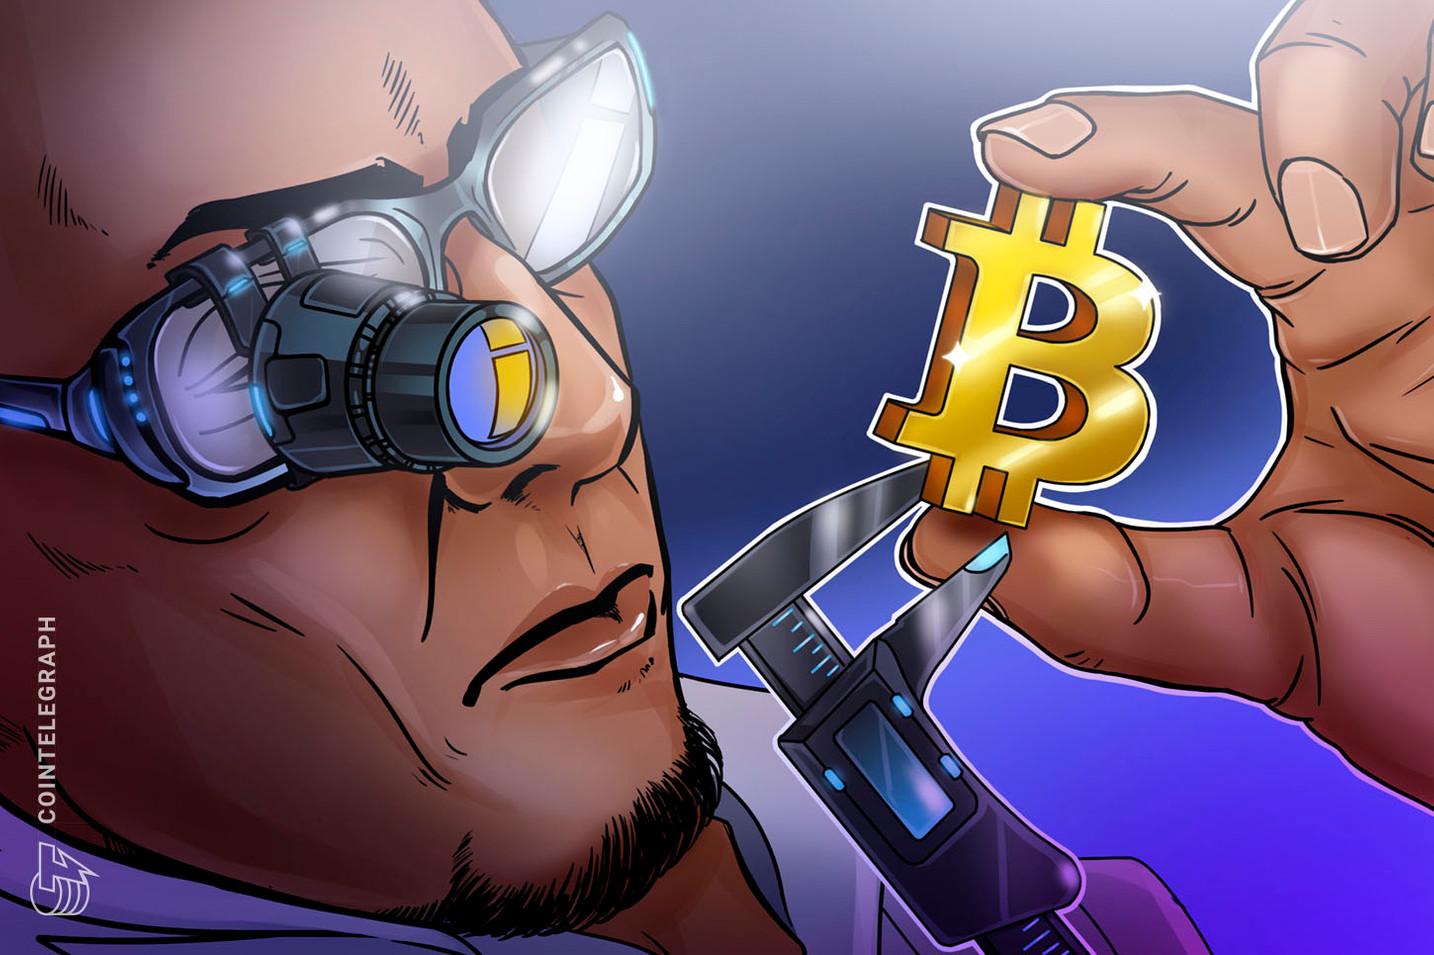 Les commerçants de Bitcoin regardent 32 330 $ avant l'expiration des options BTC de XNUMX millions de dollars de vendredi